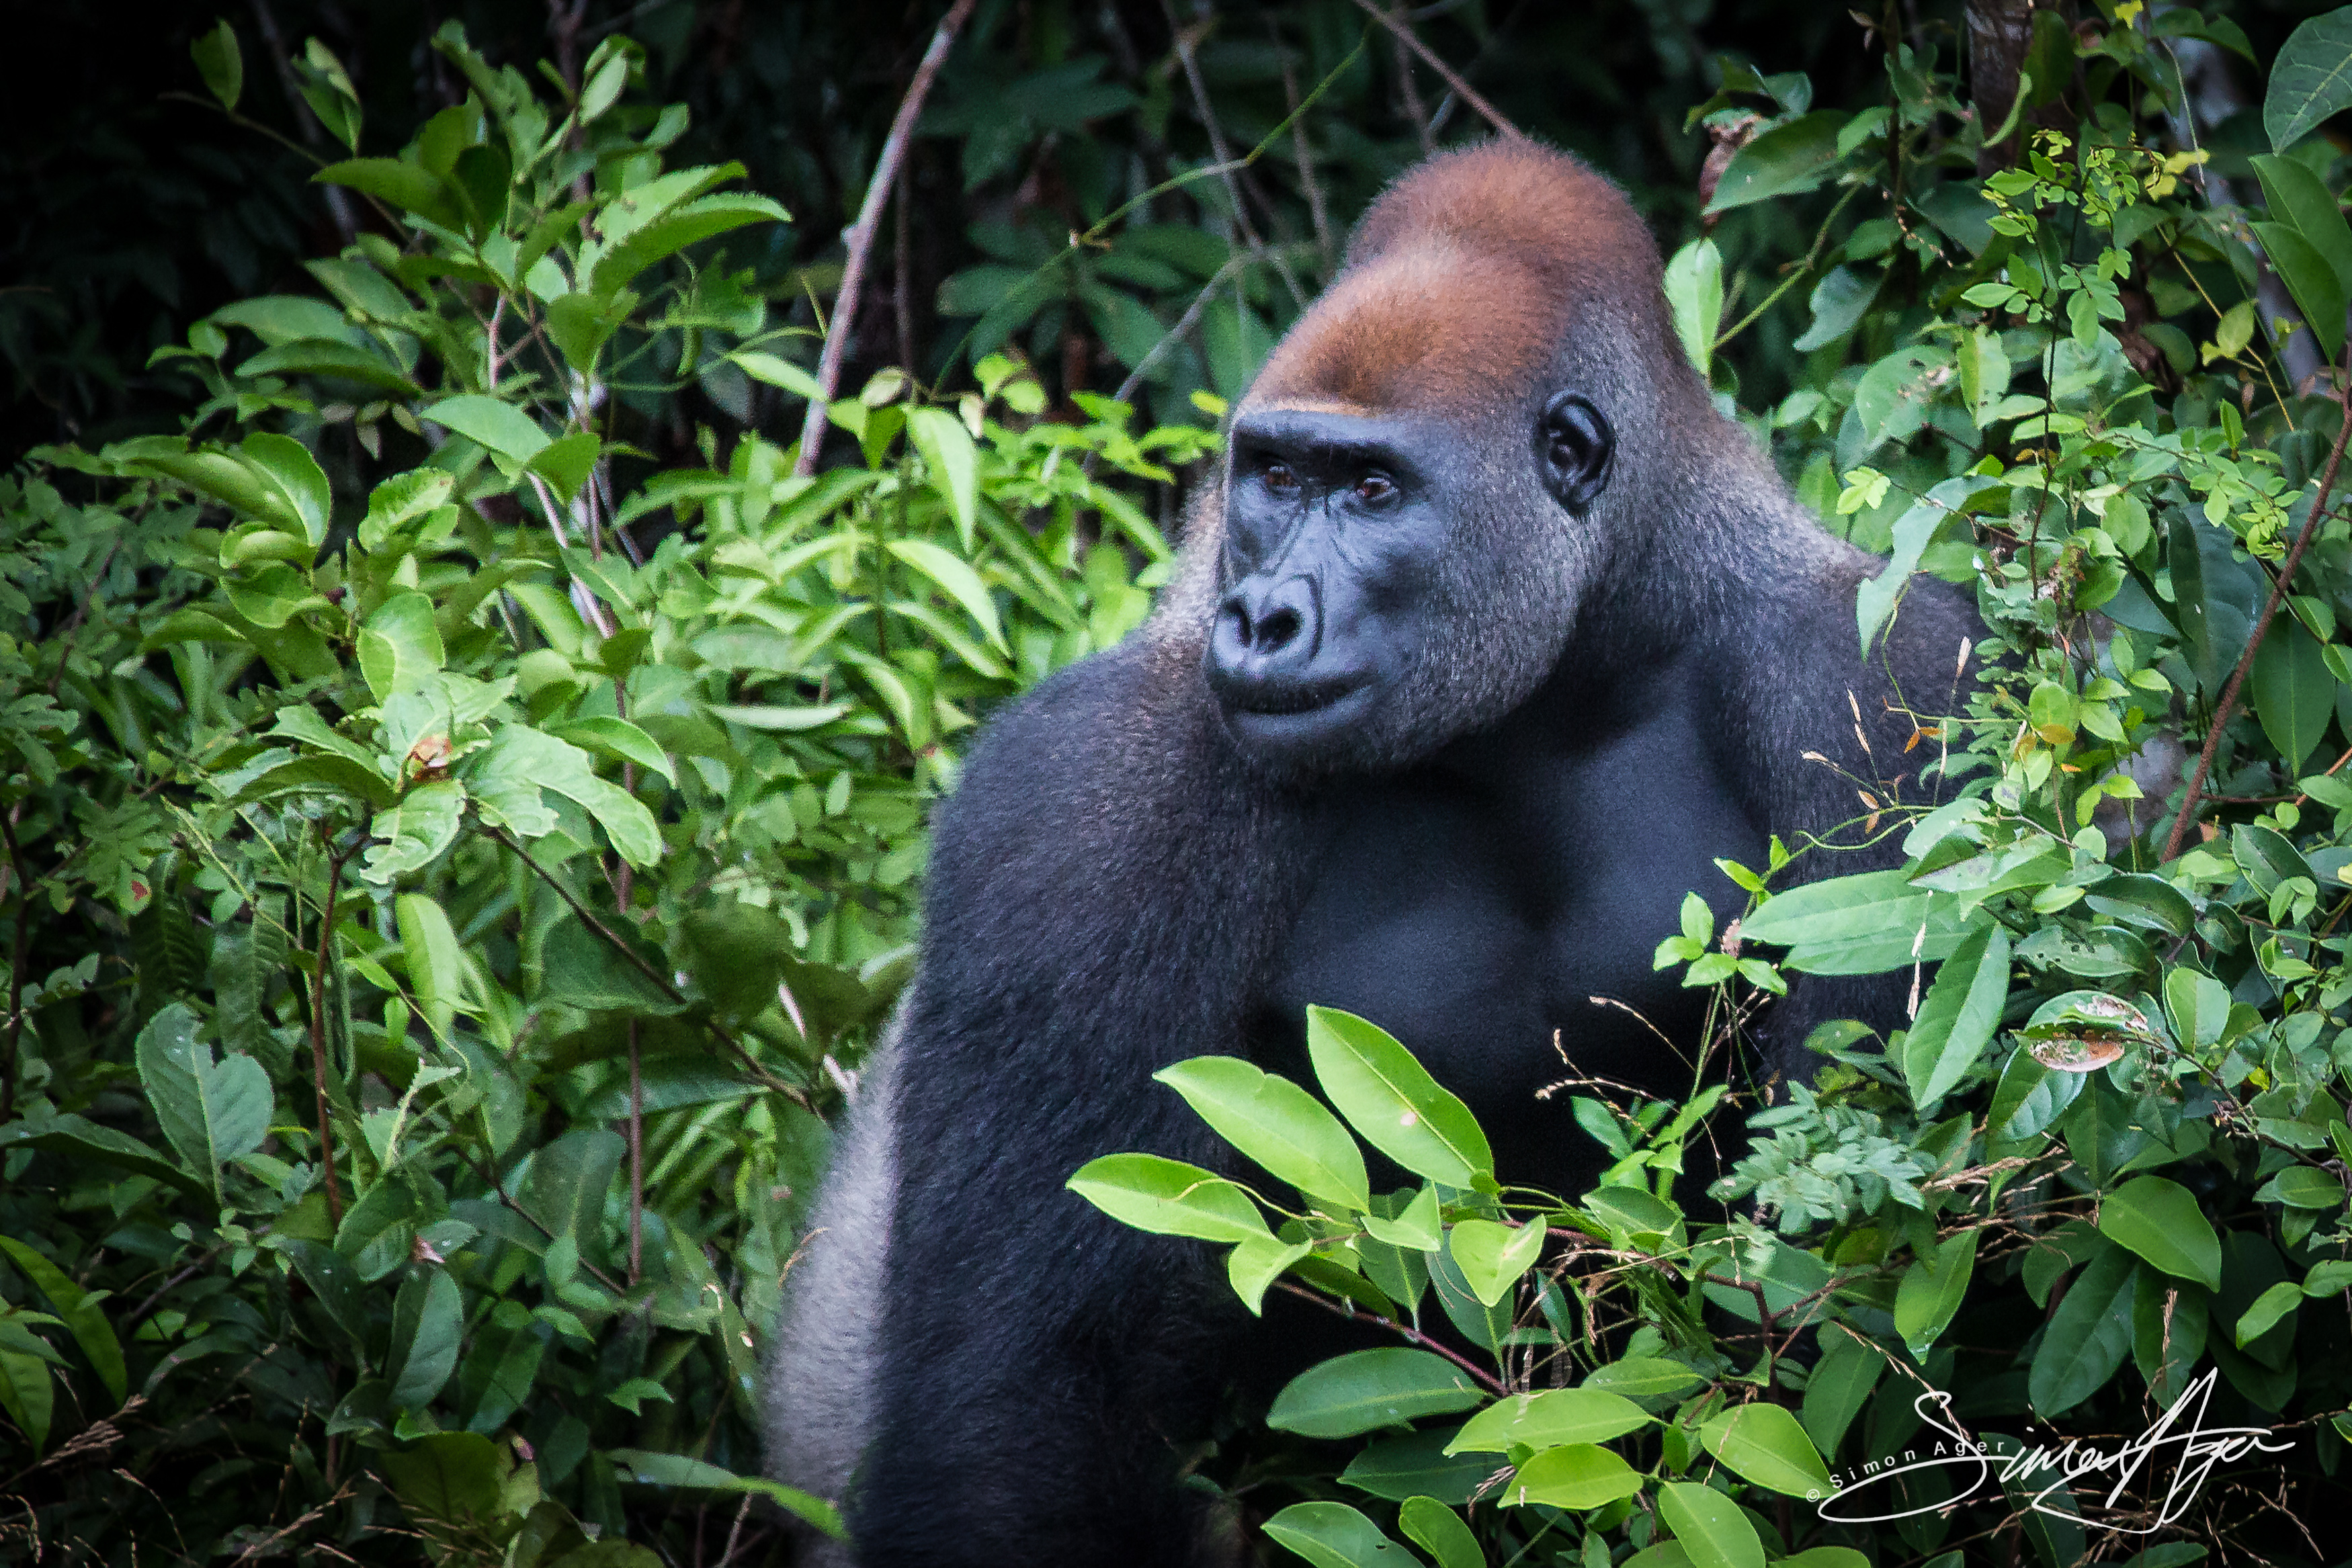 160718-SA-Fernan-Vaz-Gorilla-Project--2